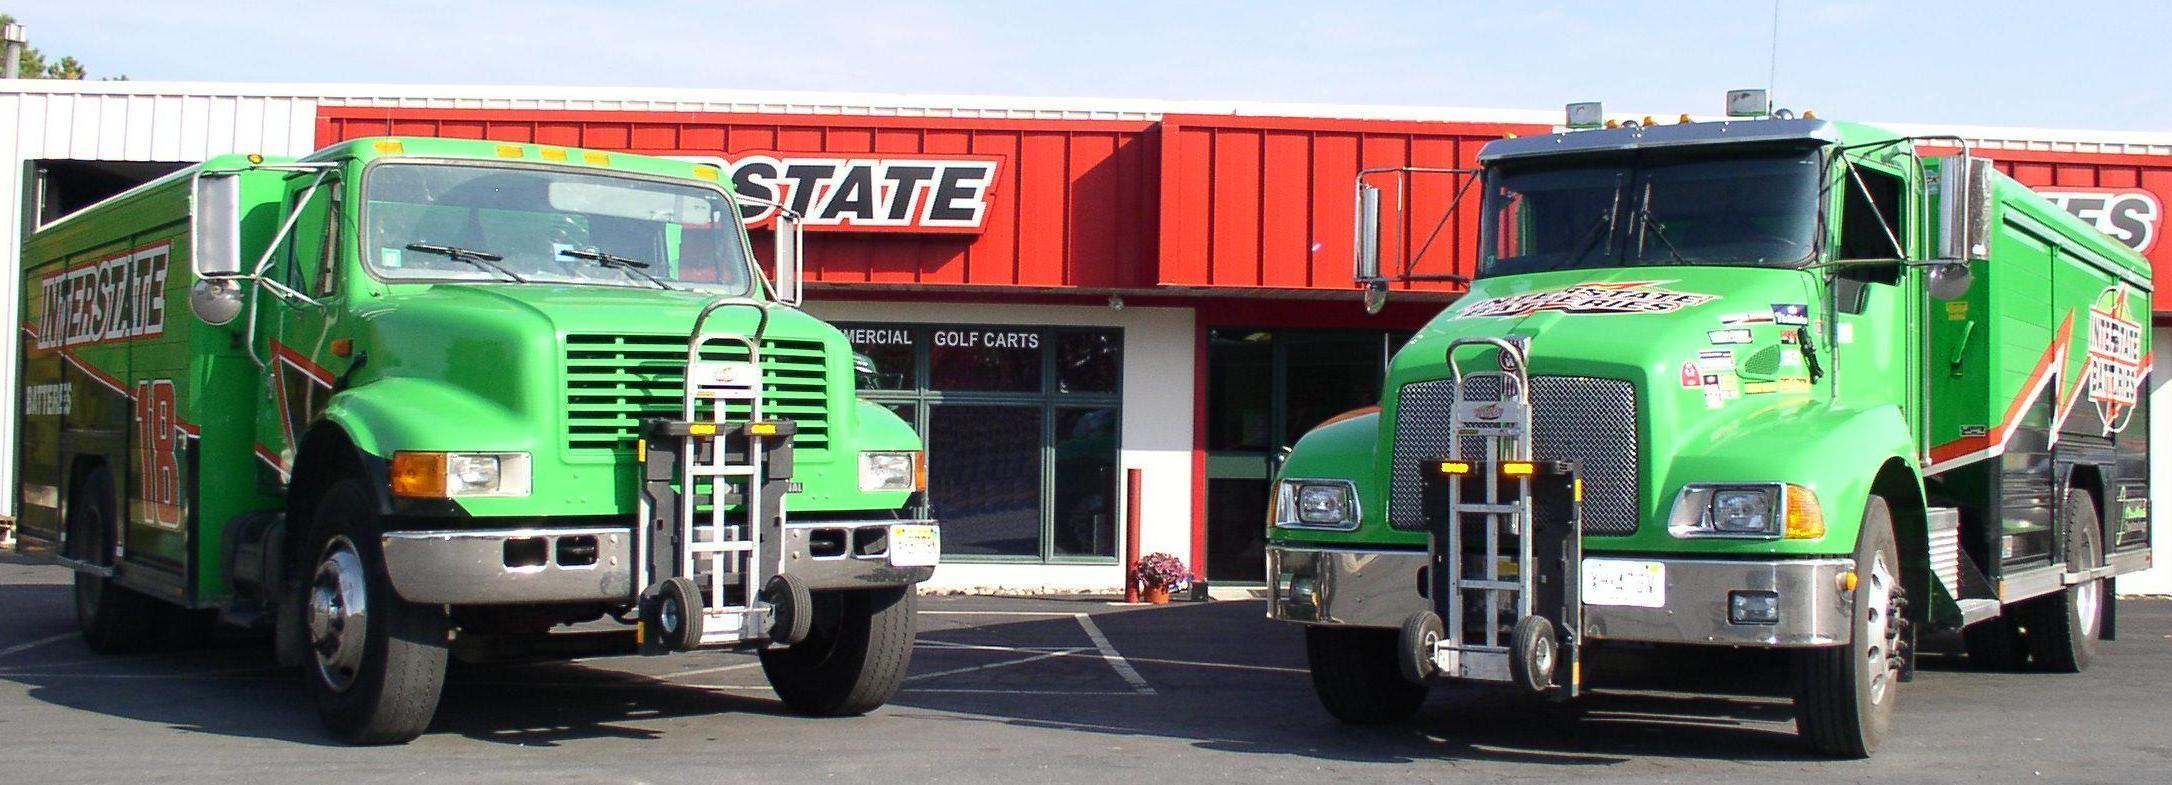 Interstate Batteries Route Delivery Trucks With Harper Trucks Aluminum Hand Trucks Locked Safely Aboard Navistar And Kenwort Hand Trucks Trucks Truck Transport